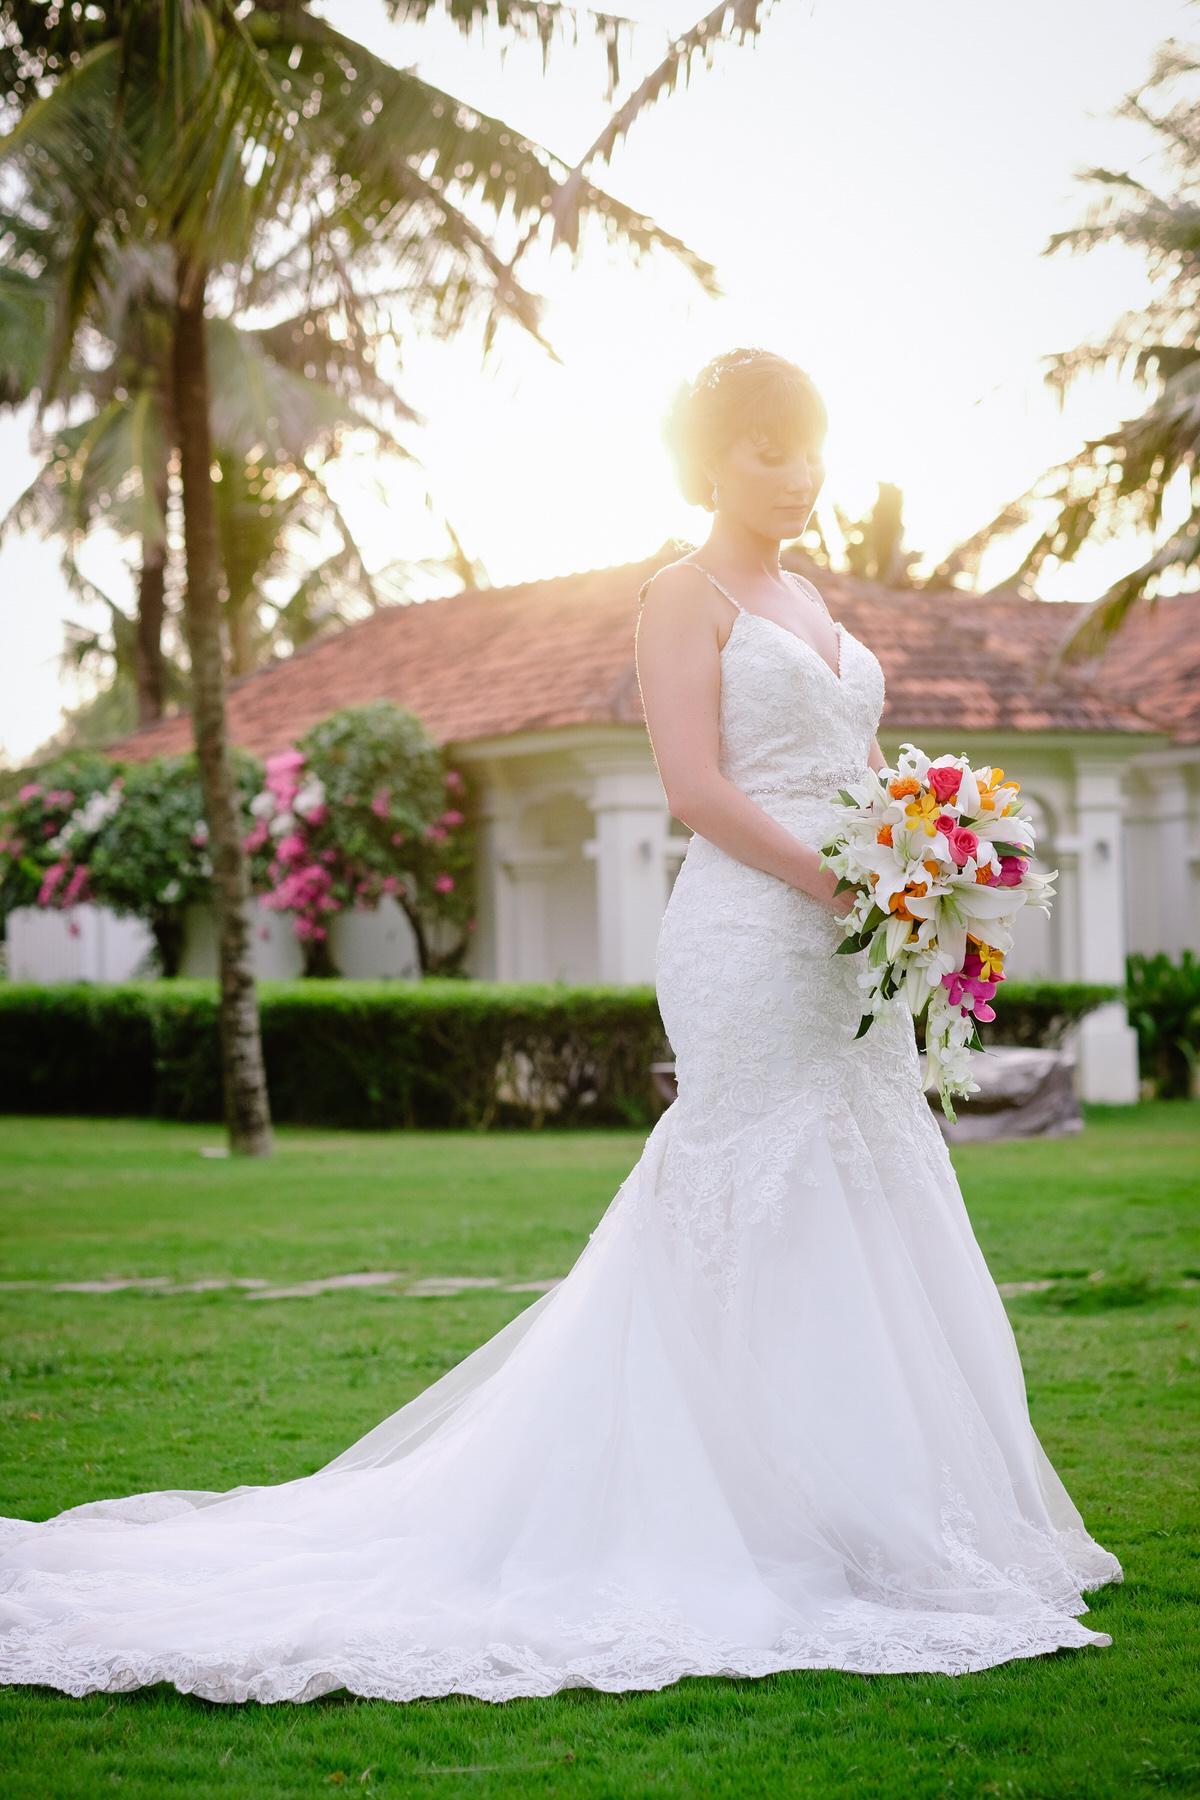 Best-of-VietNam-Wedding-Photographer_48.jpg